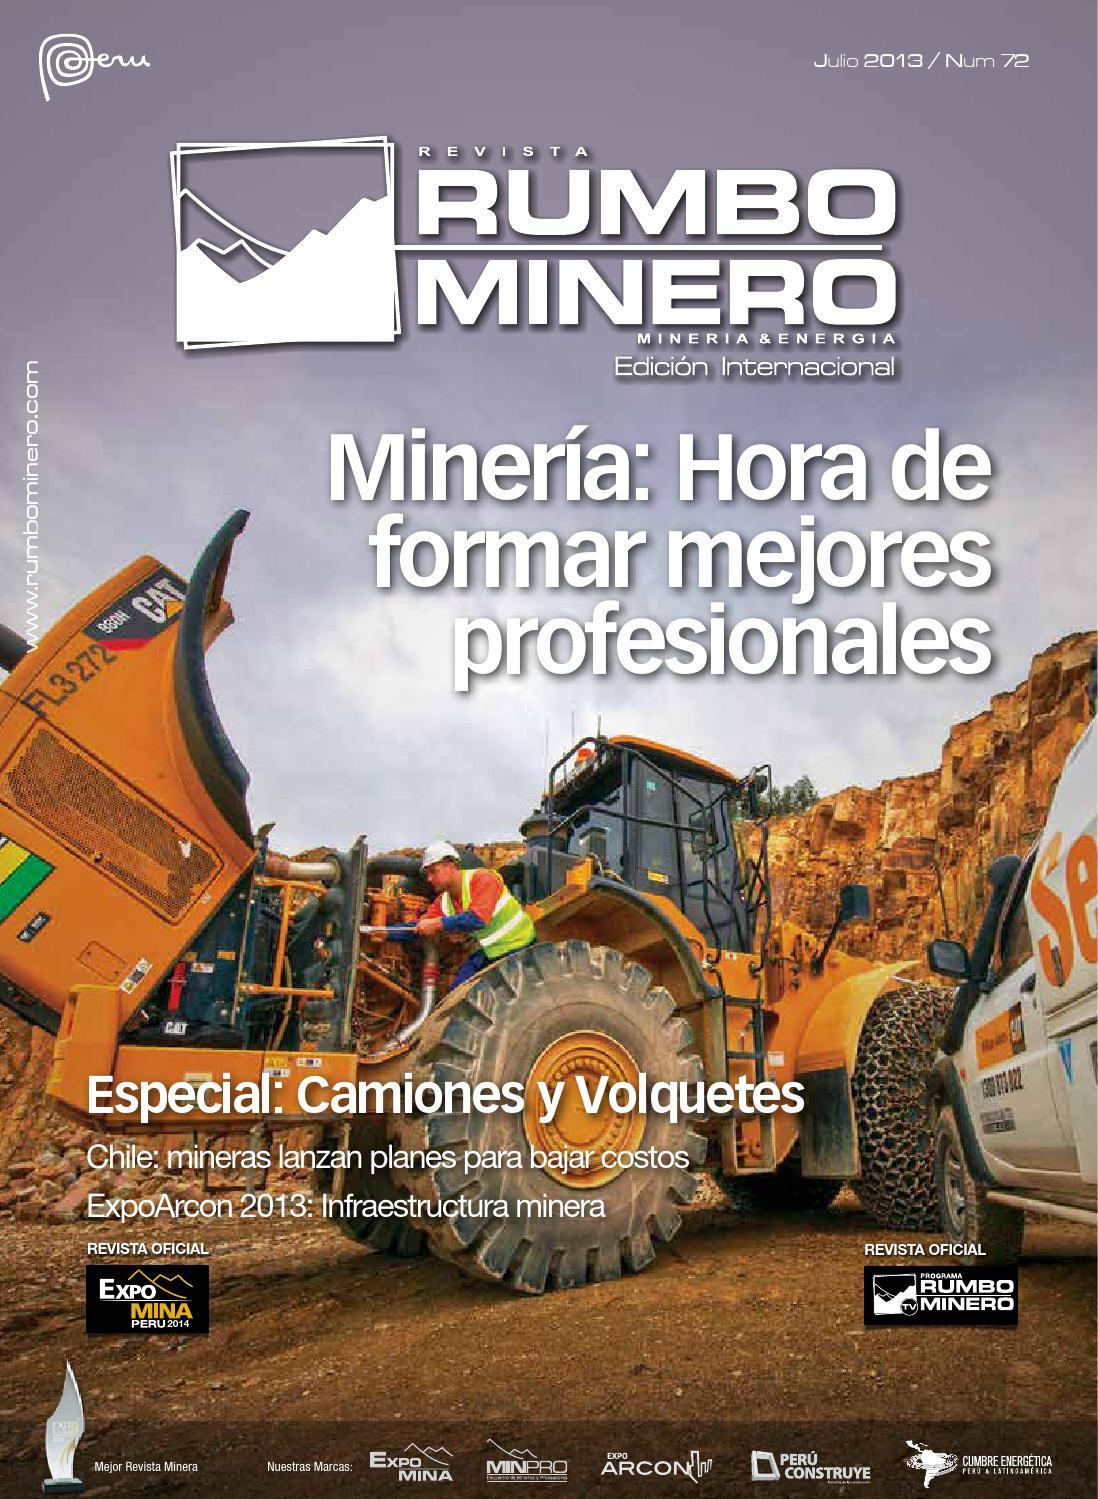 Revista Rumbo Minero N° 72 by GRUPO DIGAMMA - issuu